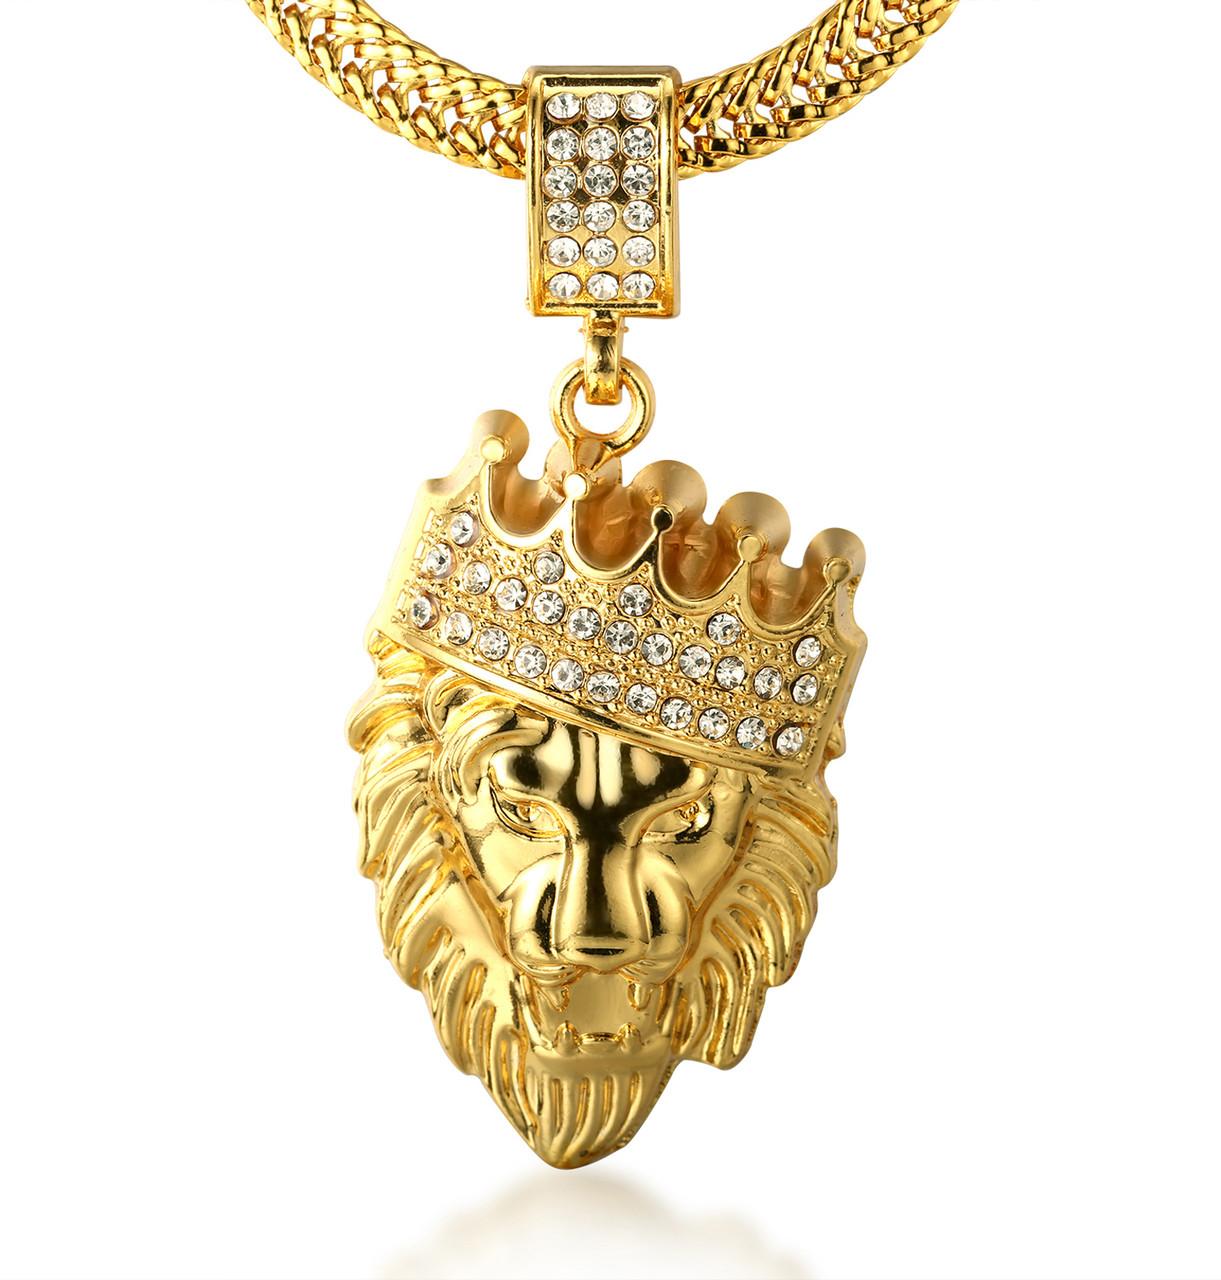 Halukakah kings landing mens 18k real gold plated crown lion halukakah kings landing mens 18k real gold plated crown lion pendant necklace with free sharktail chain aloadofball Image collections